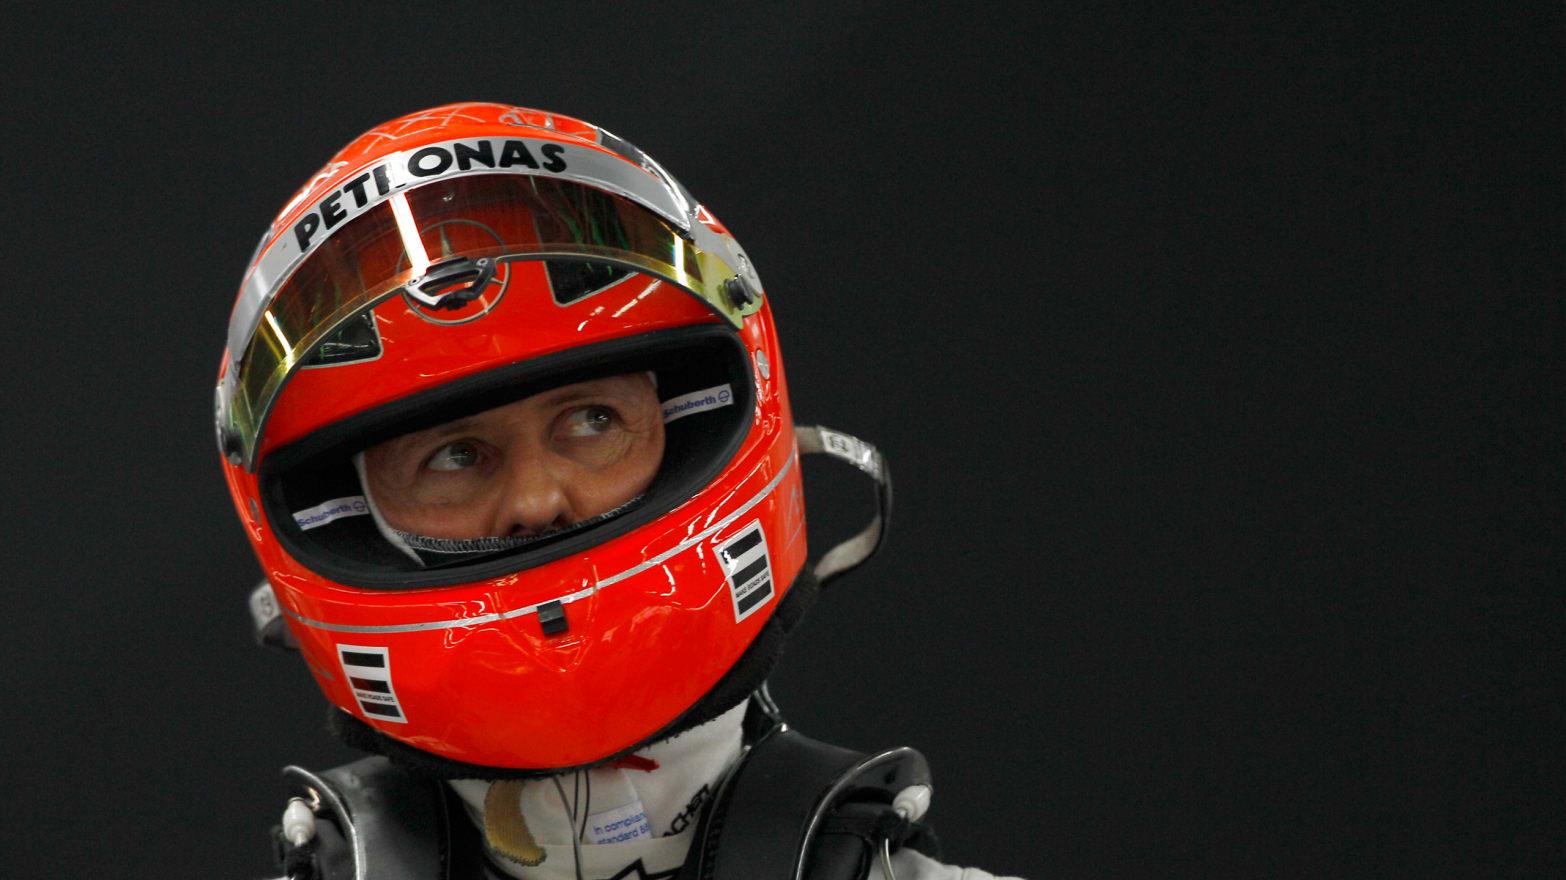 131230 formula 1 champion michael schumacher in coma after ski accident